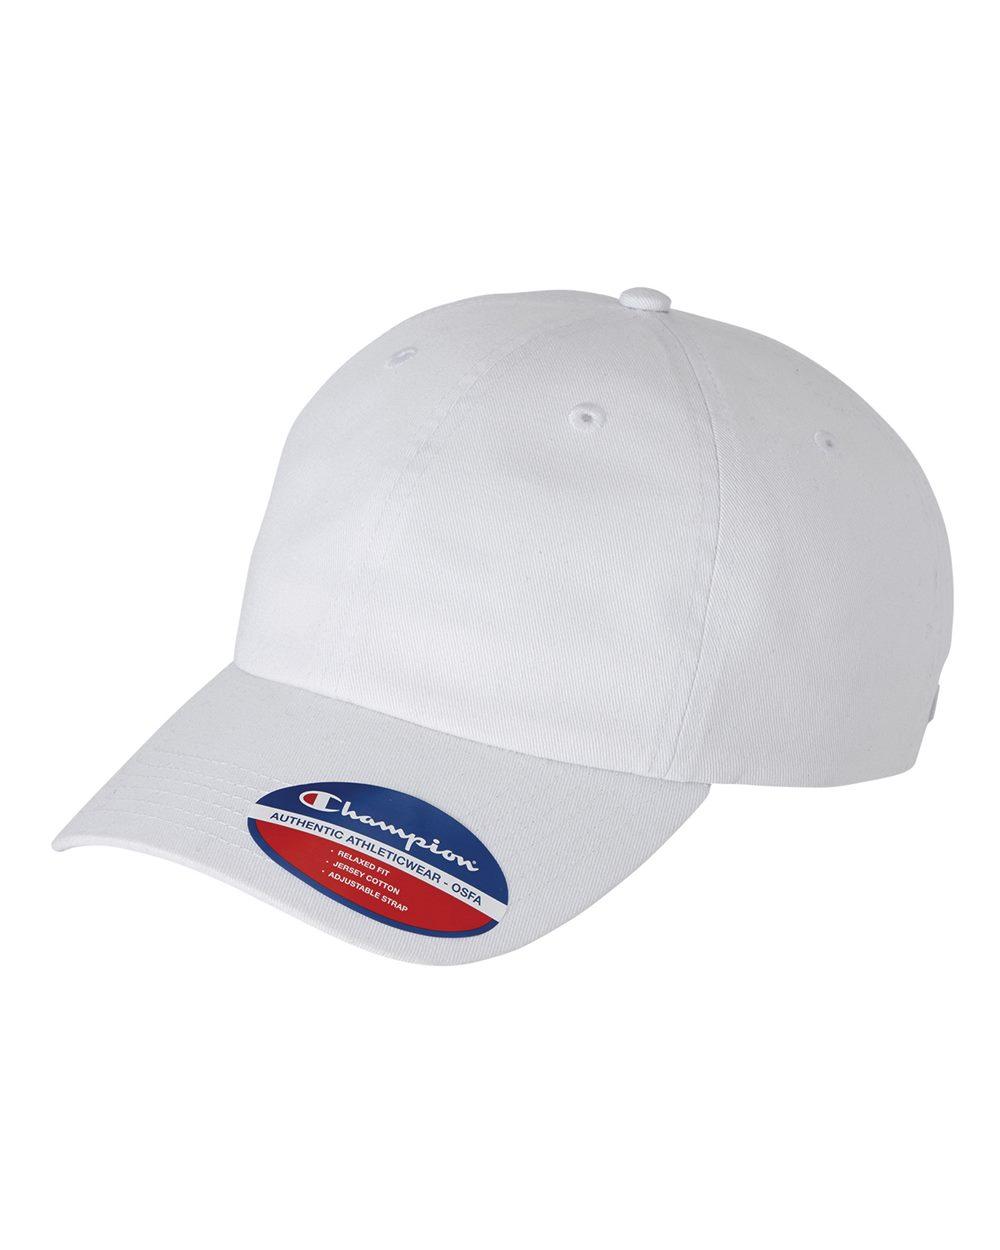 cbdcbe52411d6 Champion CS4000 - Washed Twill Dad Cap  9.36 - Headwear